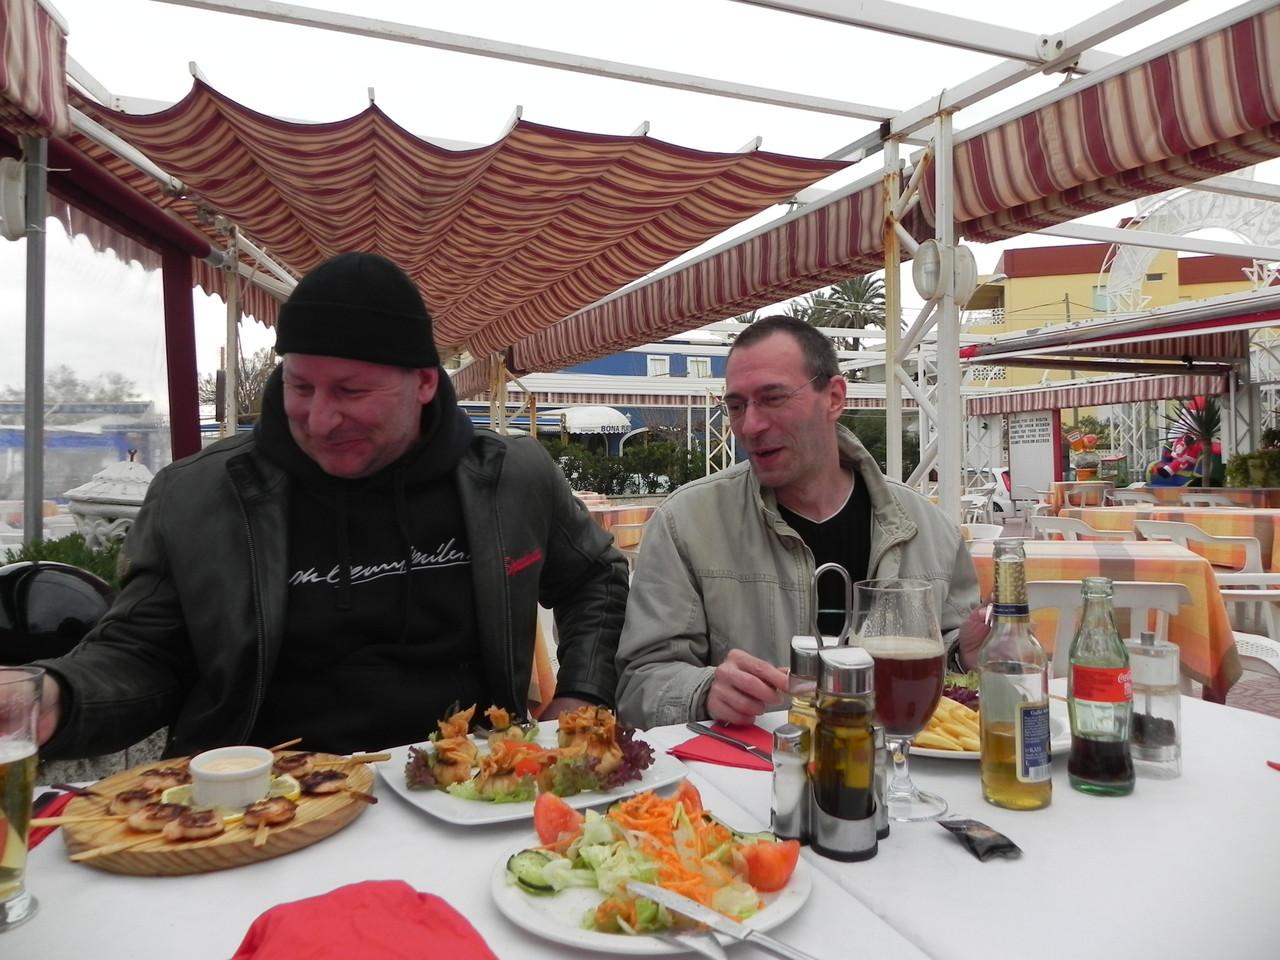 Ingo & Uwe